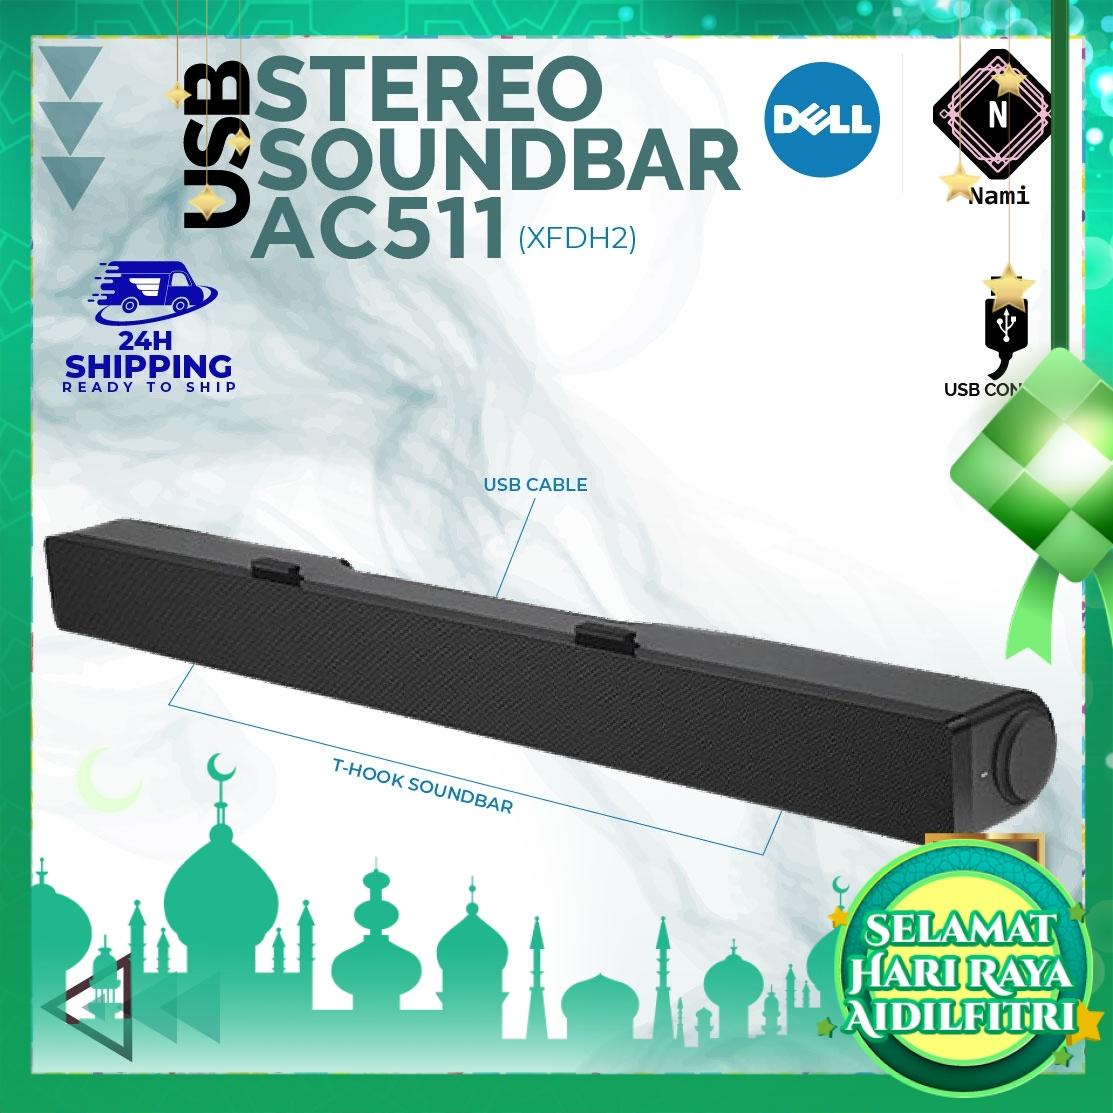 Dell Stereo USB Soundbar AC511